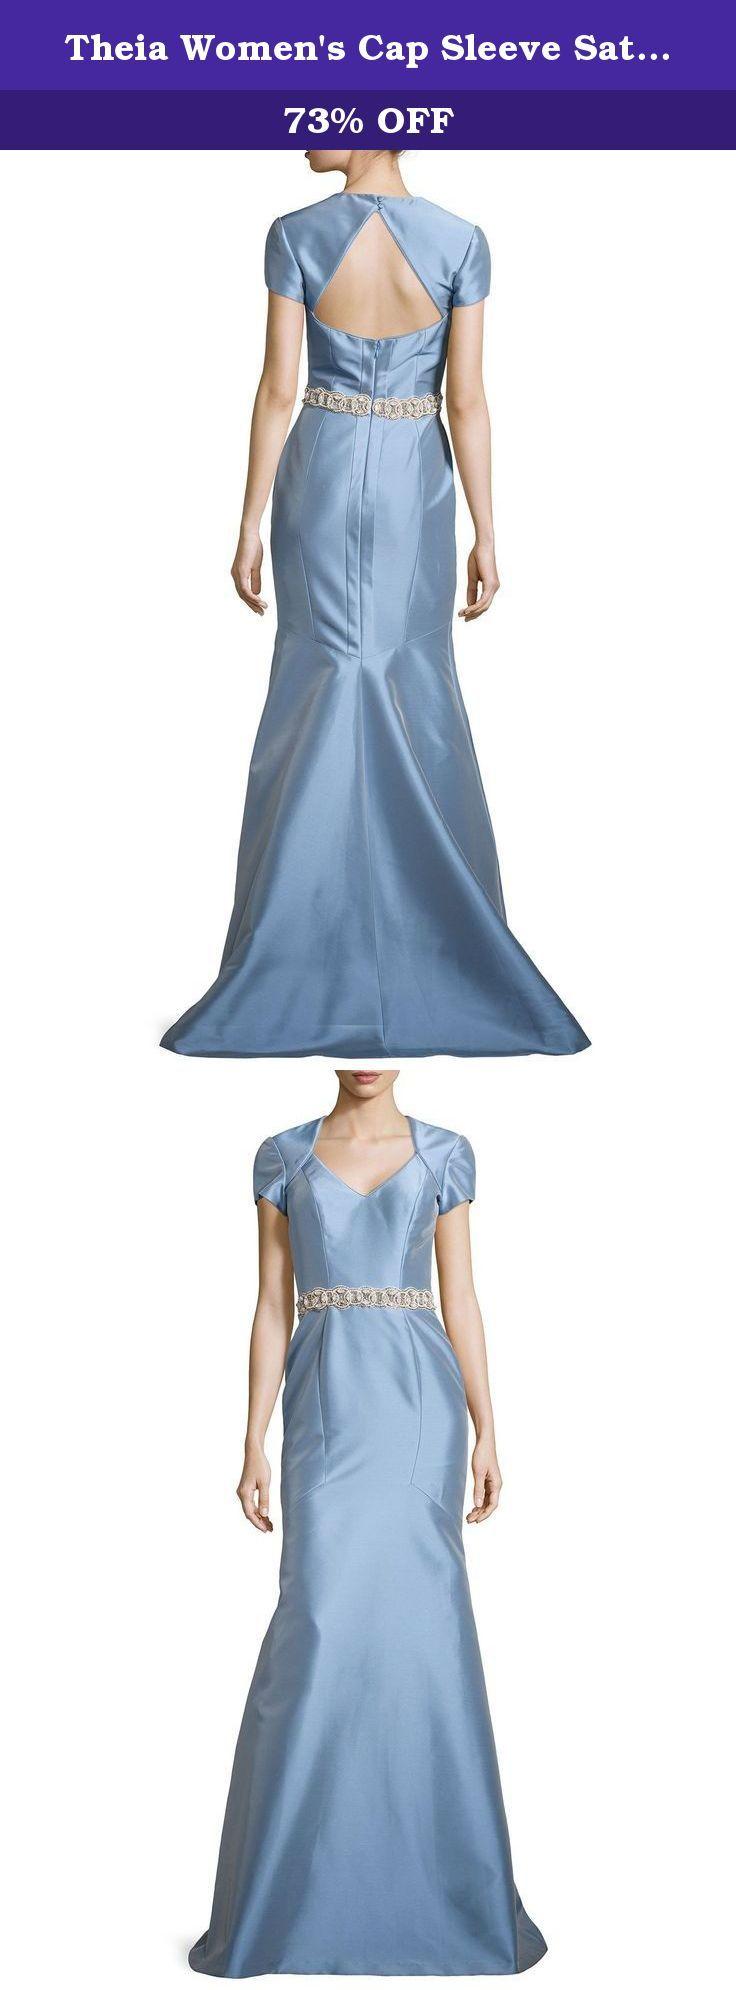 Theia Women\'s Cap Sleeve Satin Mermaid Dress 14 Powder Blue. Full ...